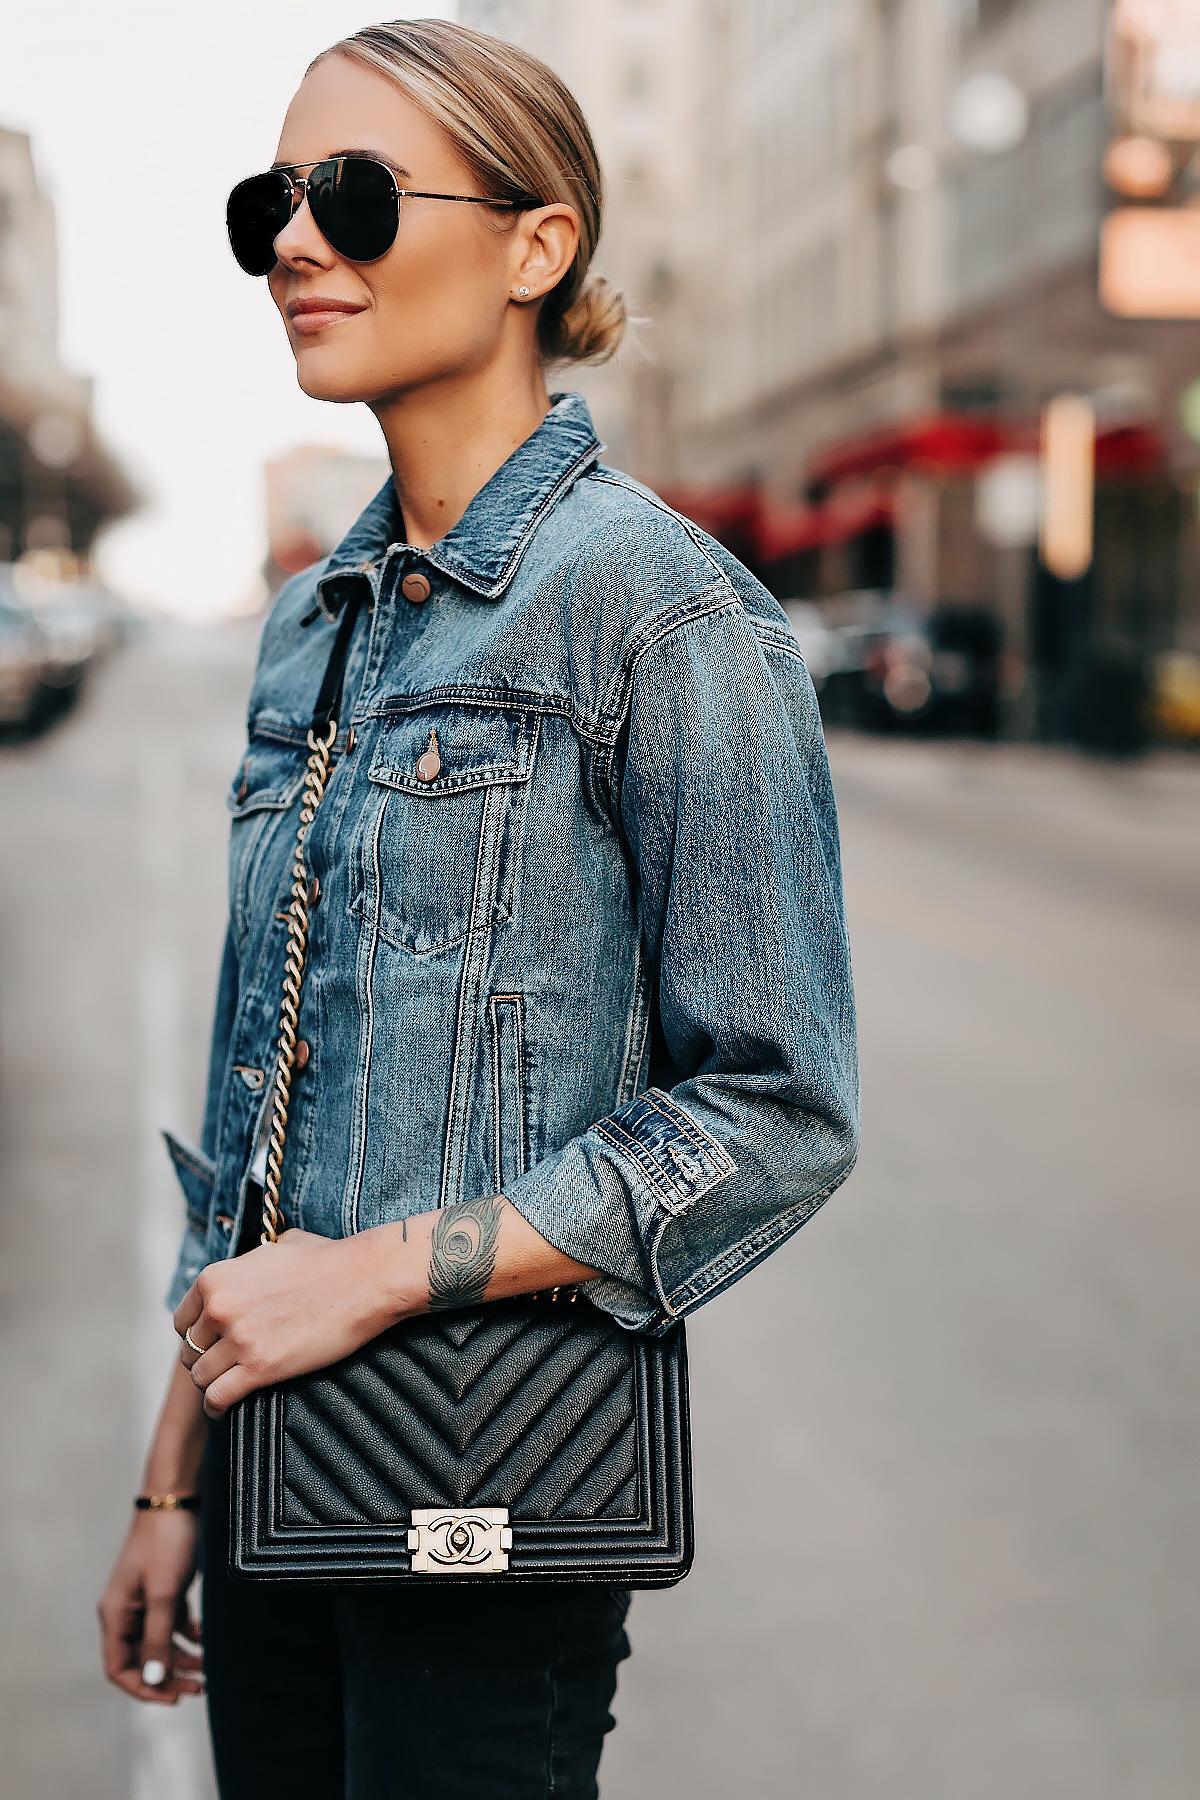 Blonde Woman Wearing Denim Jacket Black Jeans Chanel Black Boy Bag Fashion Jackson San Diego Fashion Blogger Street Style